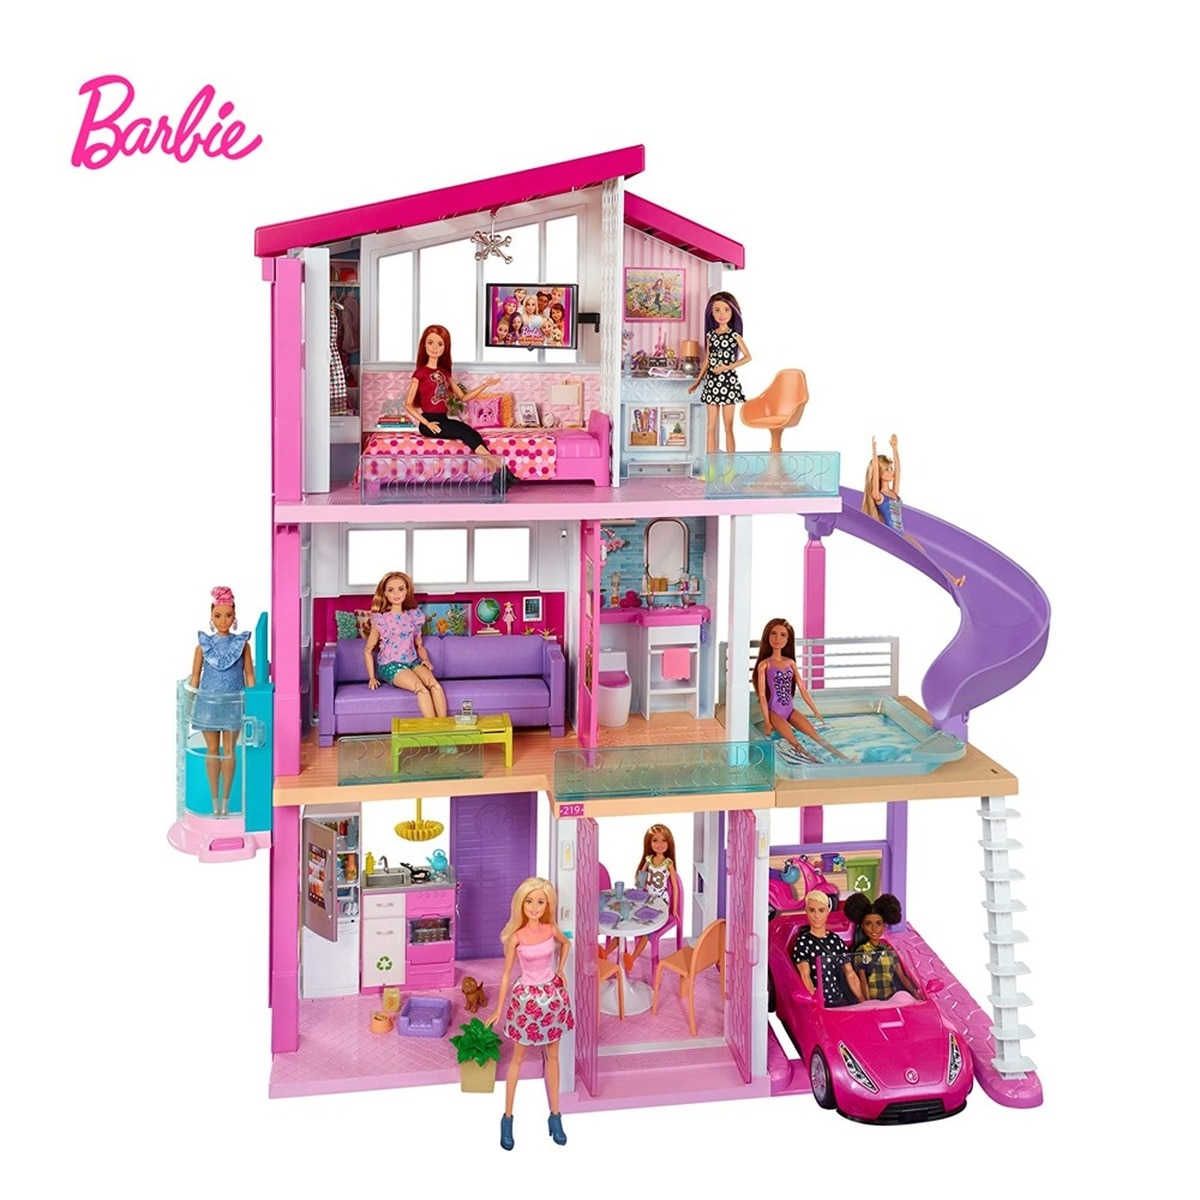 Casa de muñecas Barbie de Dreamhouse con piscina, Tobogán, elevador, 3 juguetes...